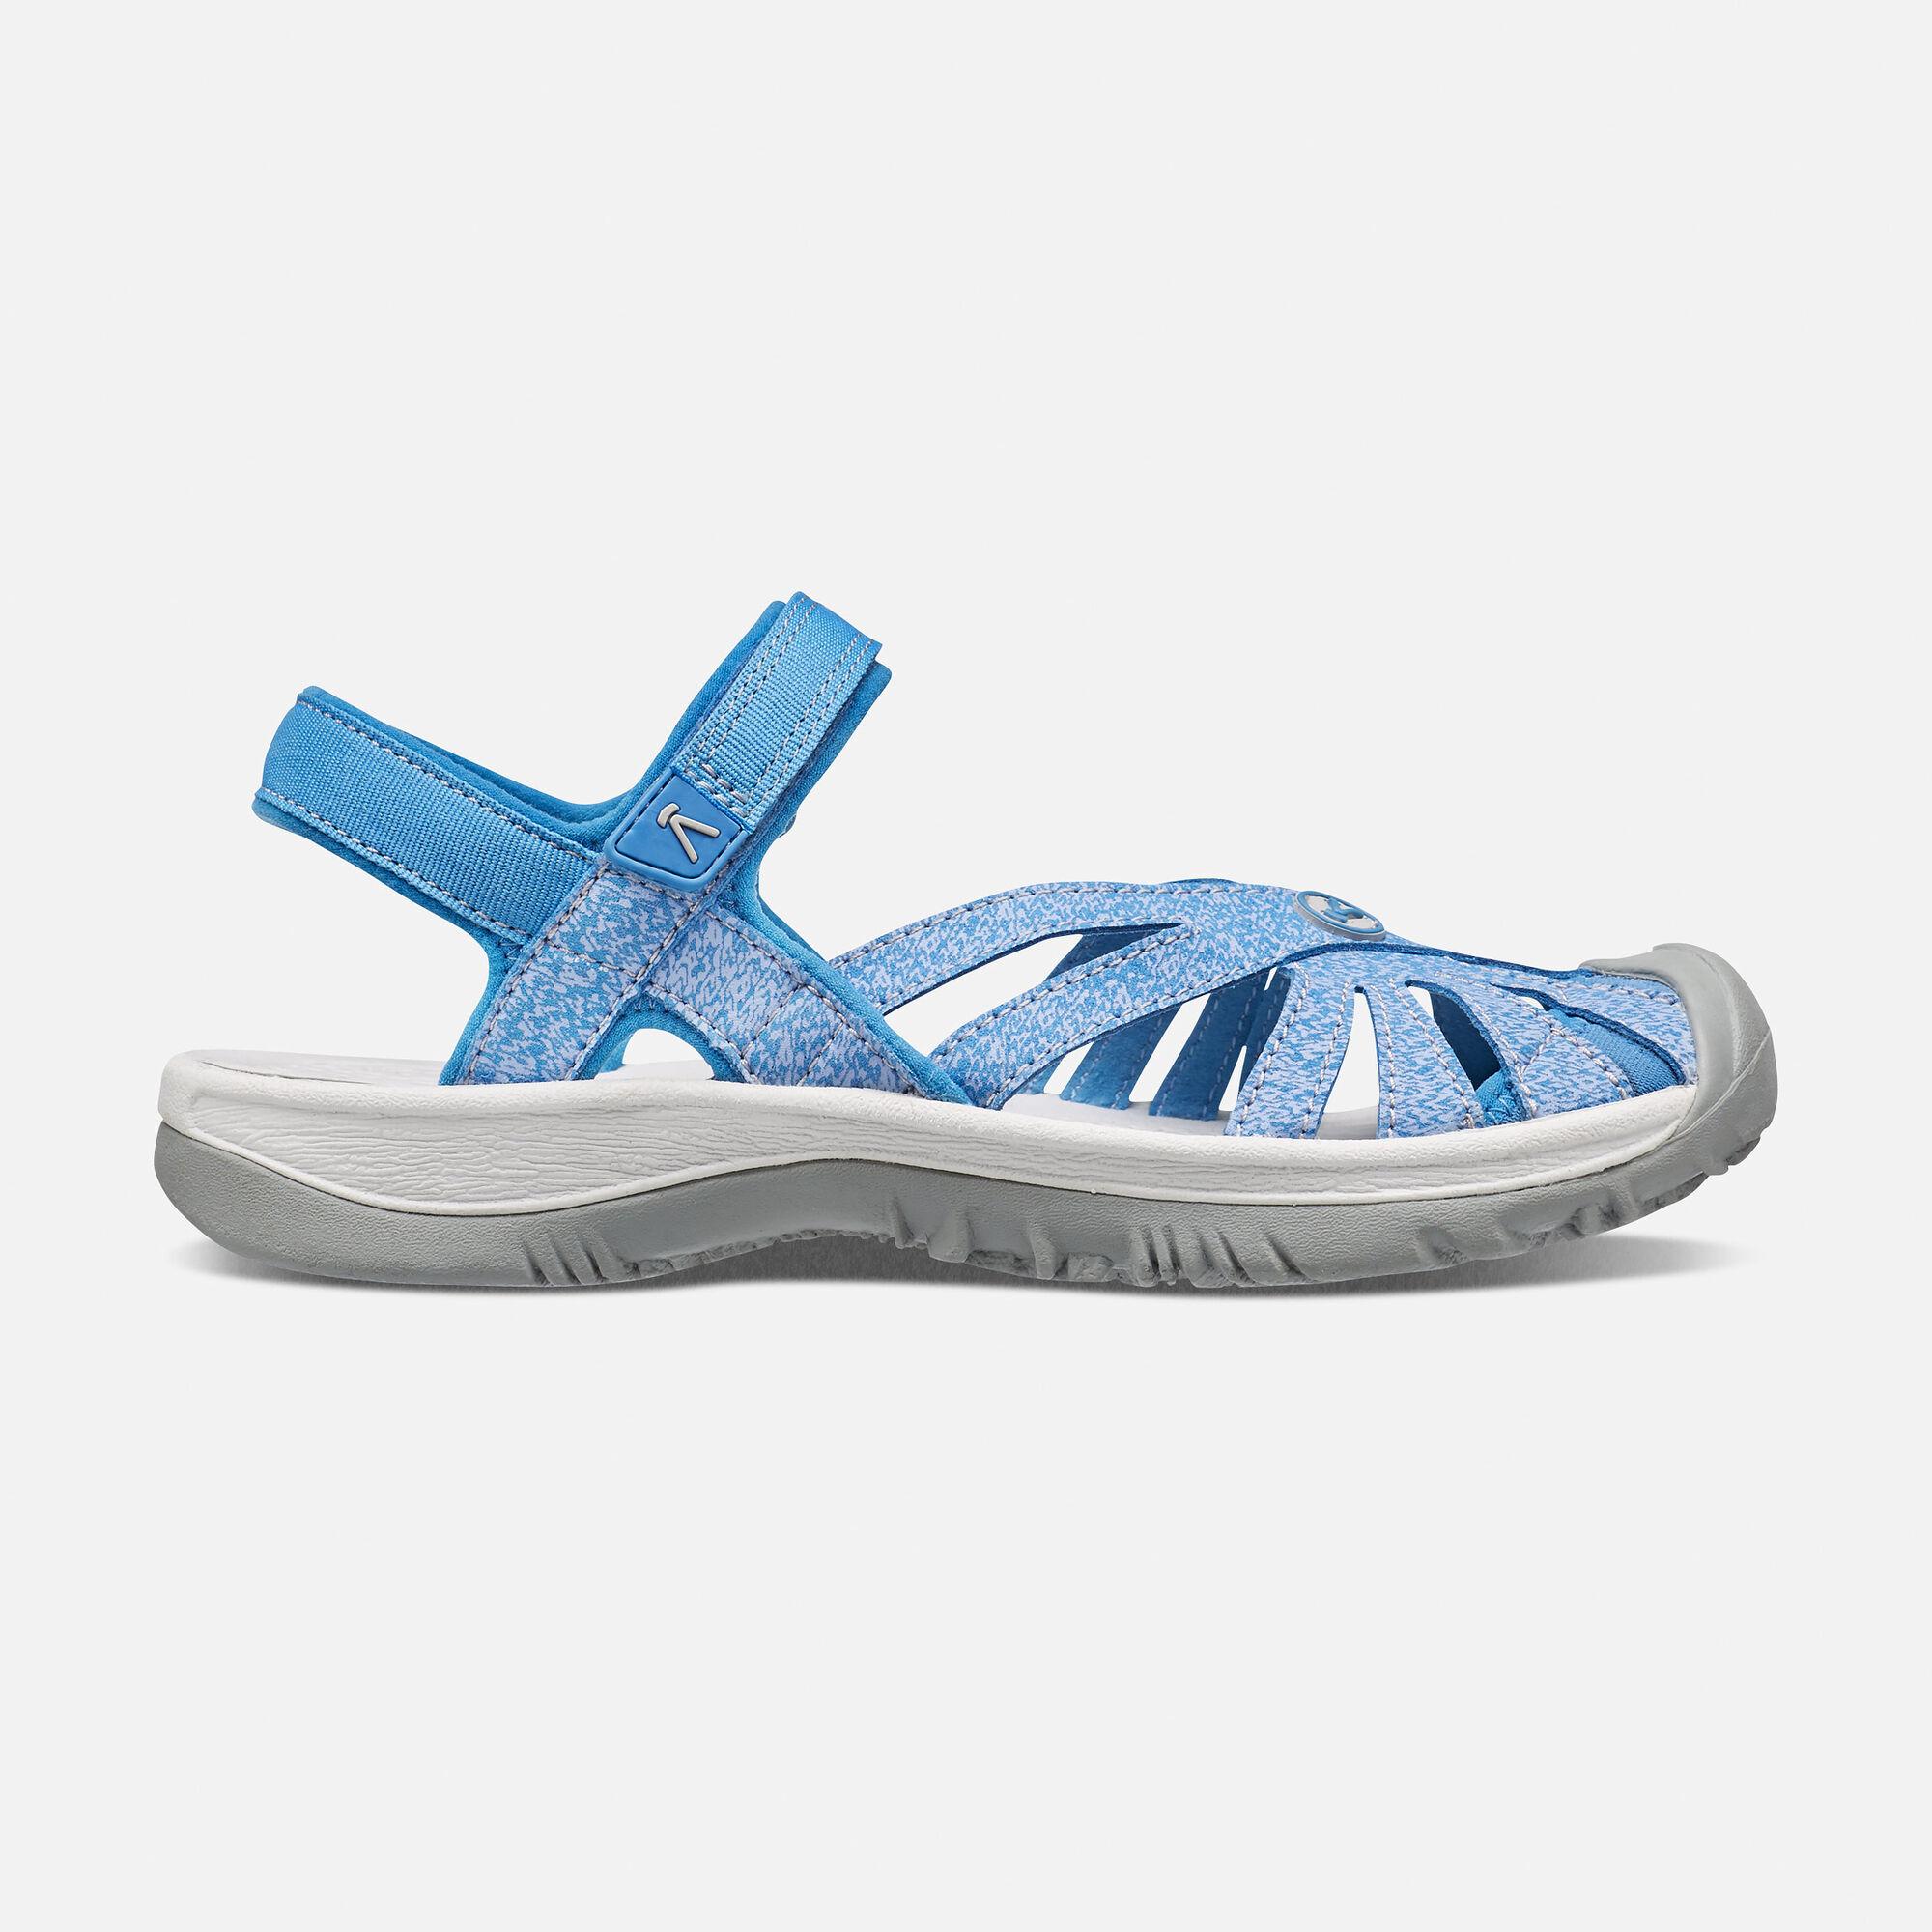 Women's sandals big w - Women S Rose Sandal In Cendre Blue Blue Bell Small View